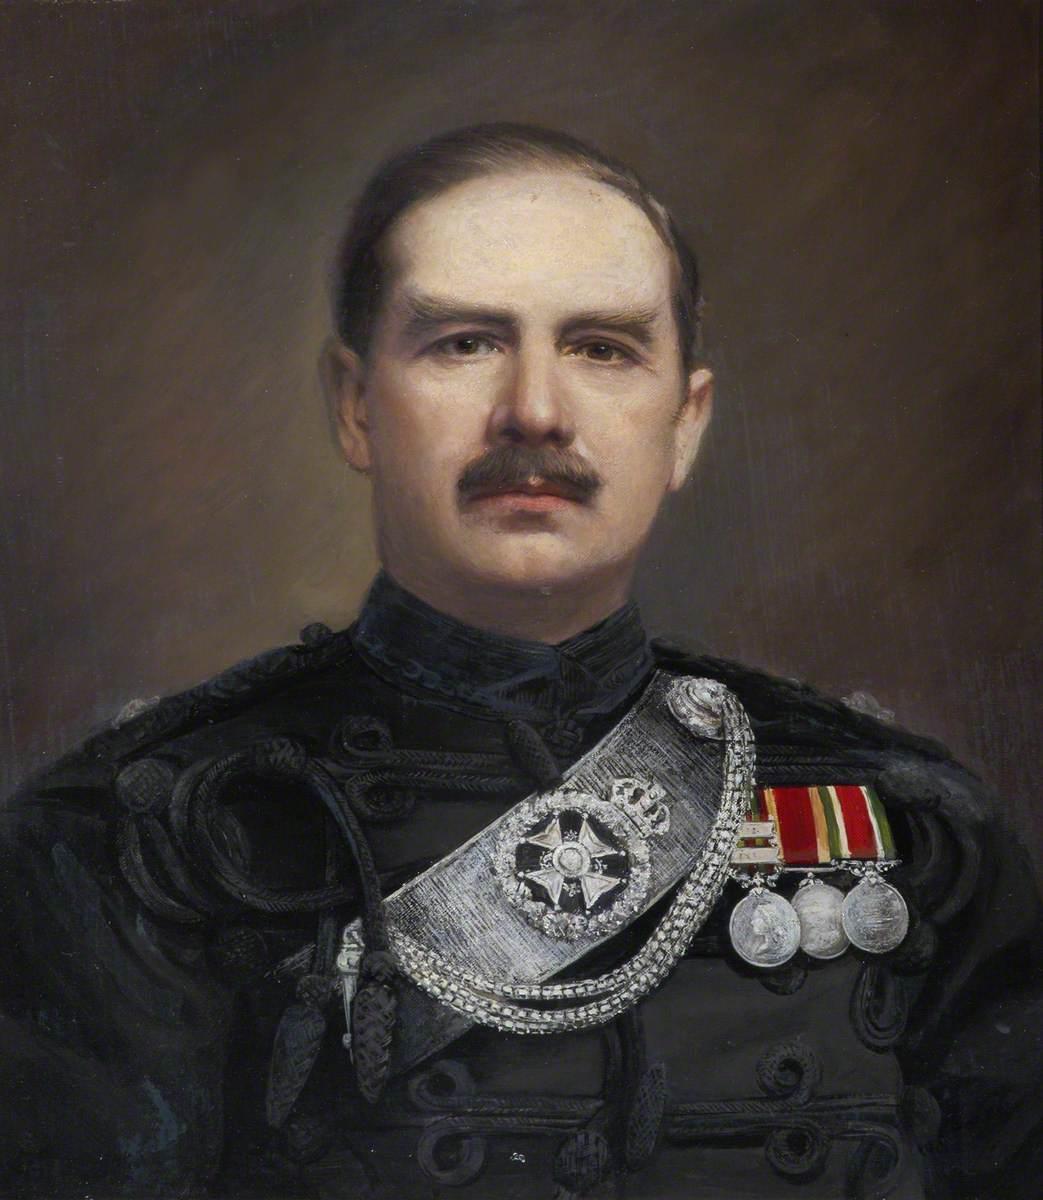 Major (later Lieutenant Colonel) David Henry Drake-Brockman (1868–1960), 39th Garhwal Rifles